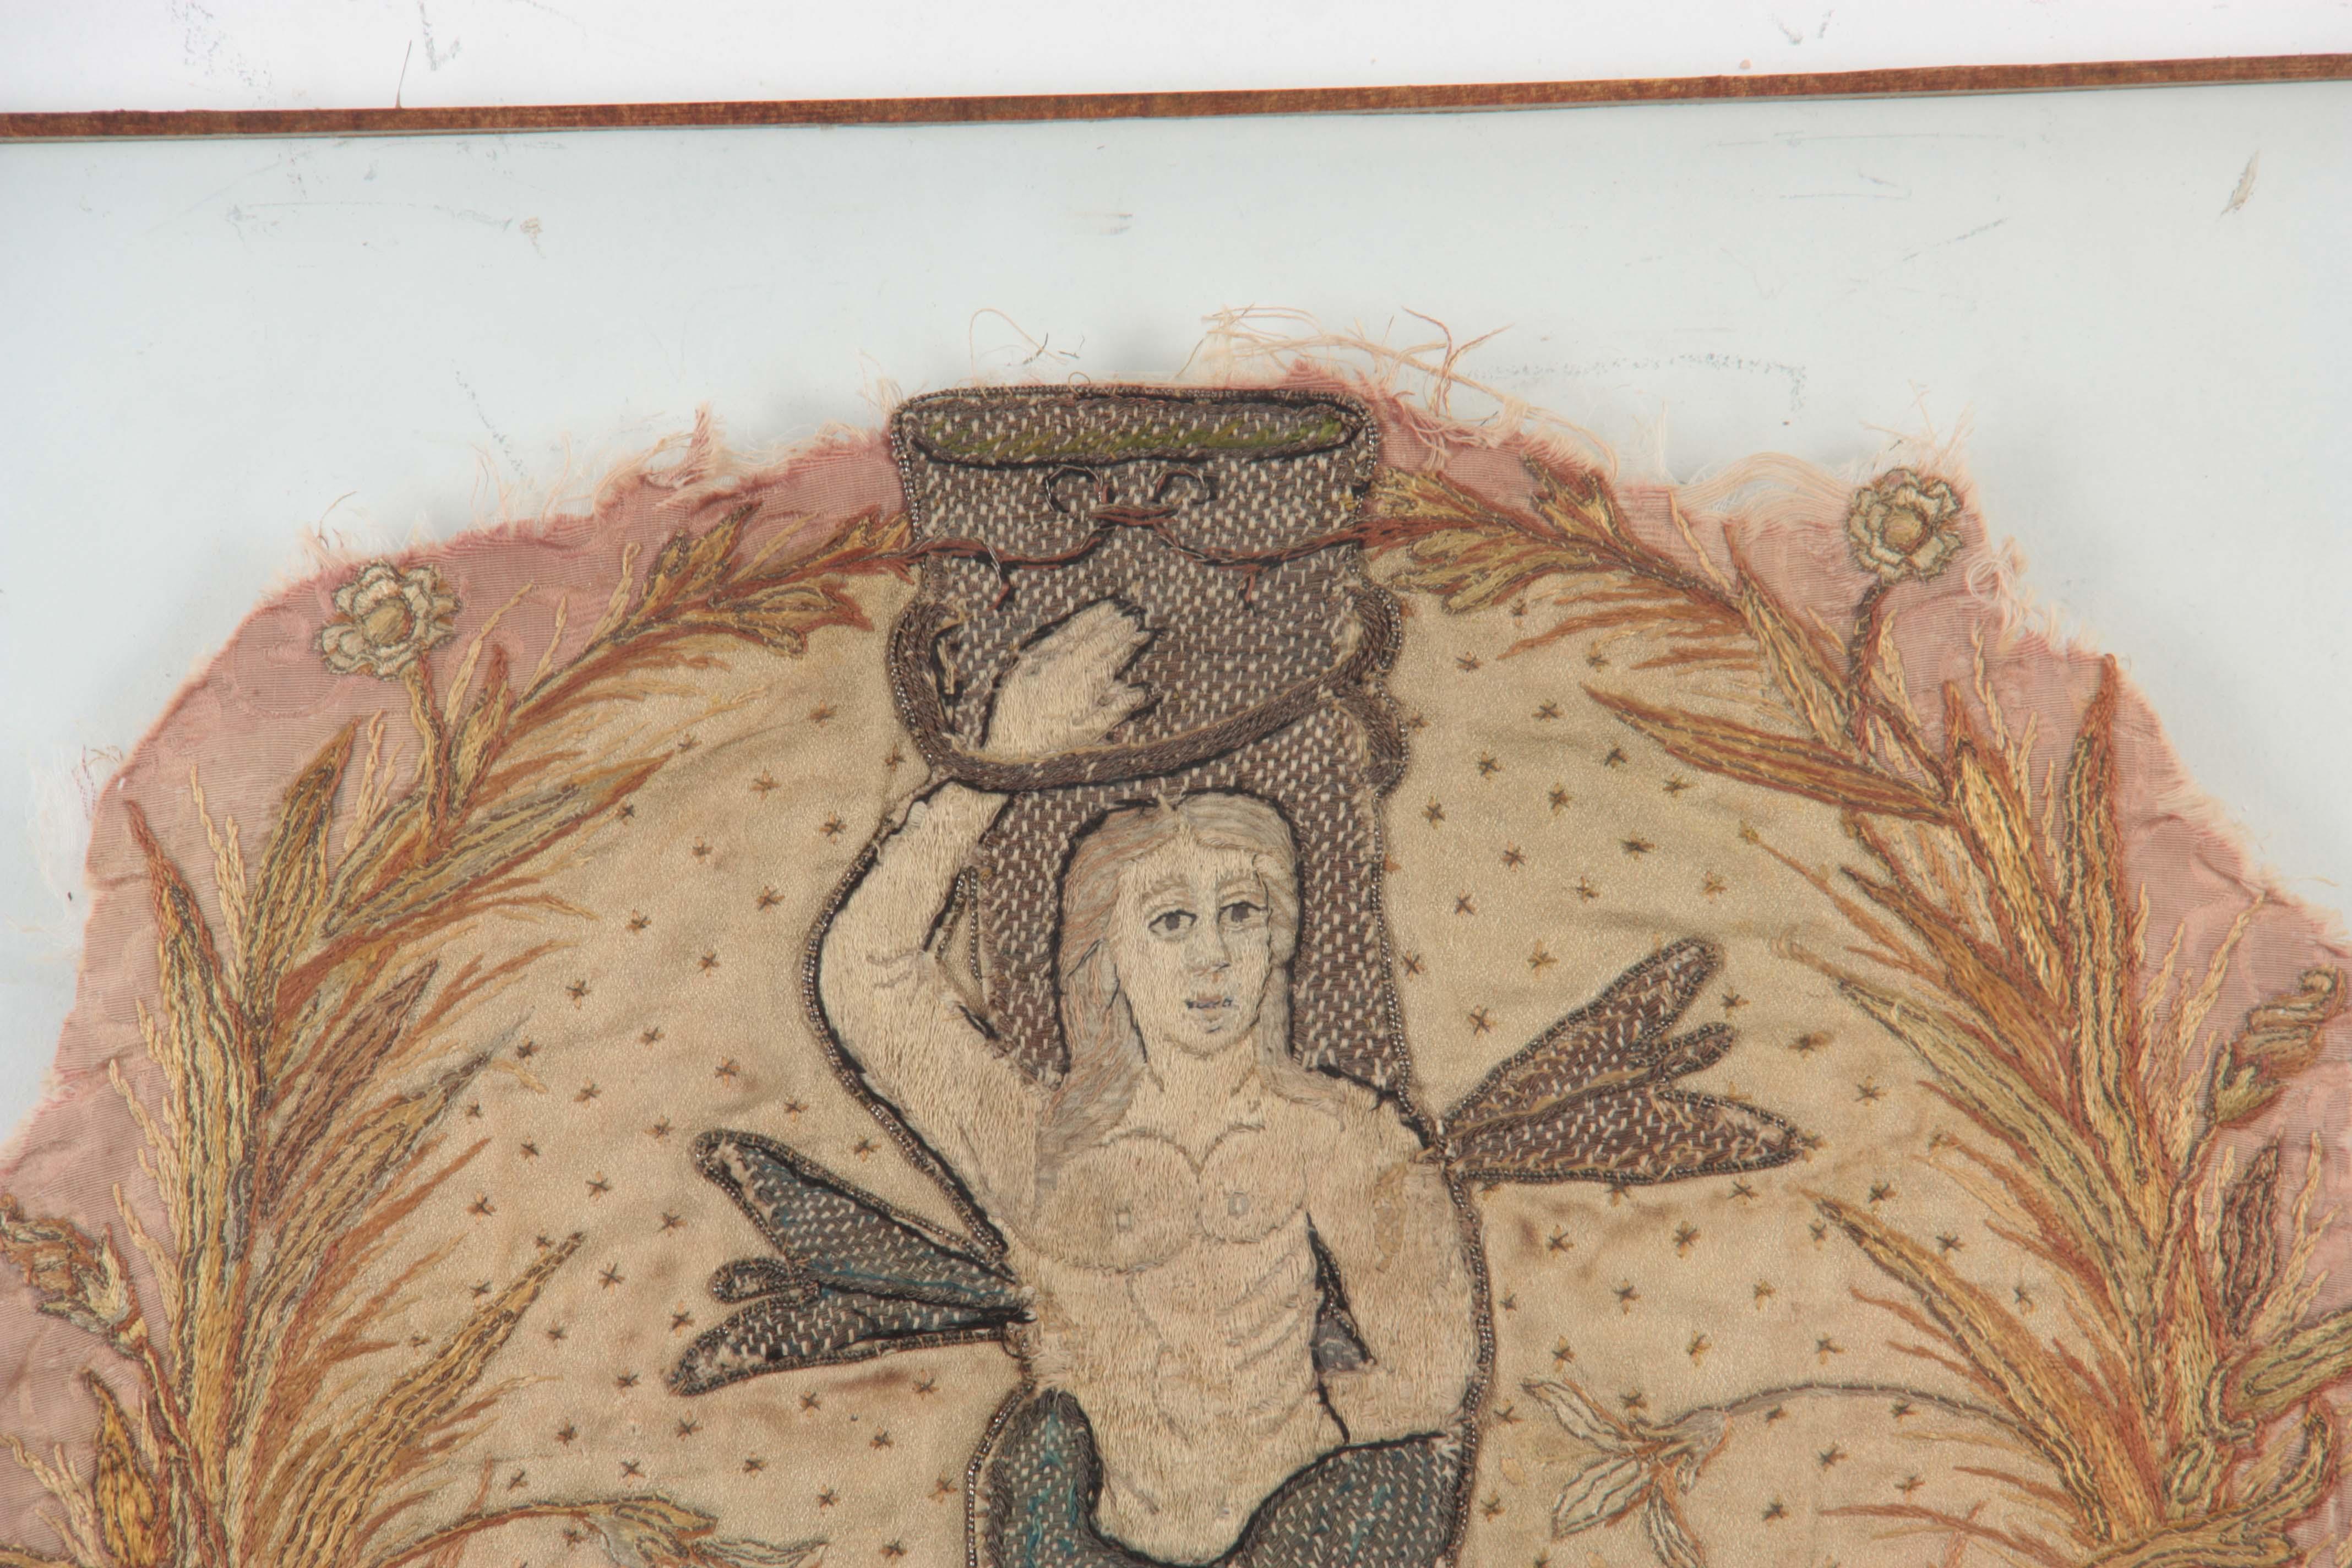 Lot 643 - A 17TH CENTURY SILK EMBROIDERED STUMPWORK PANEL depicting a standing figure of Saint Sebastian